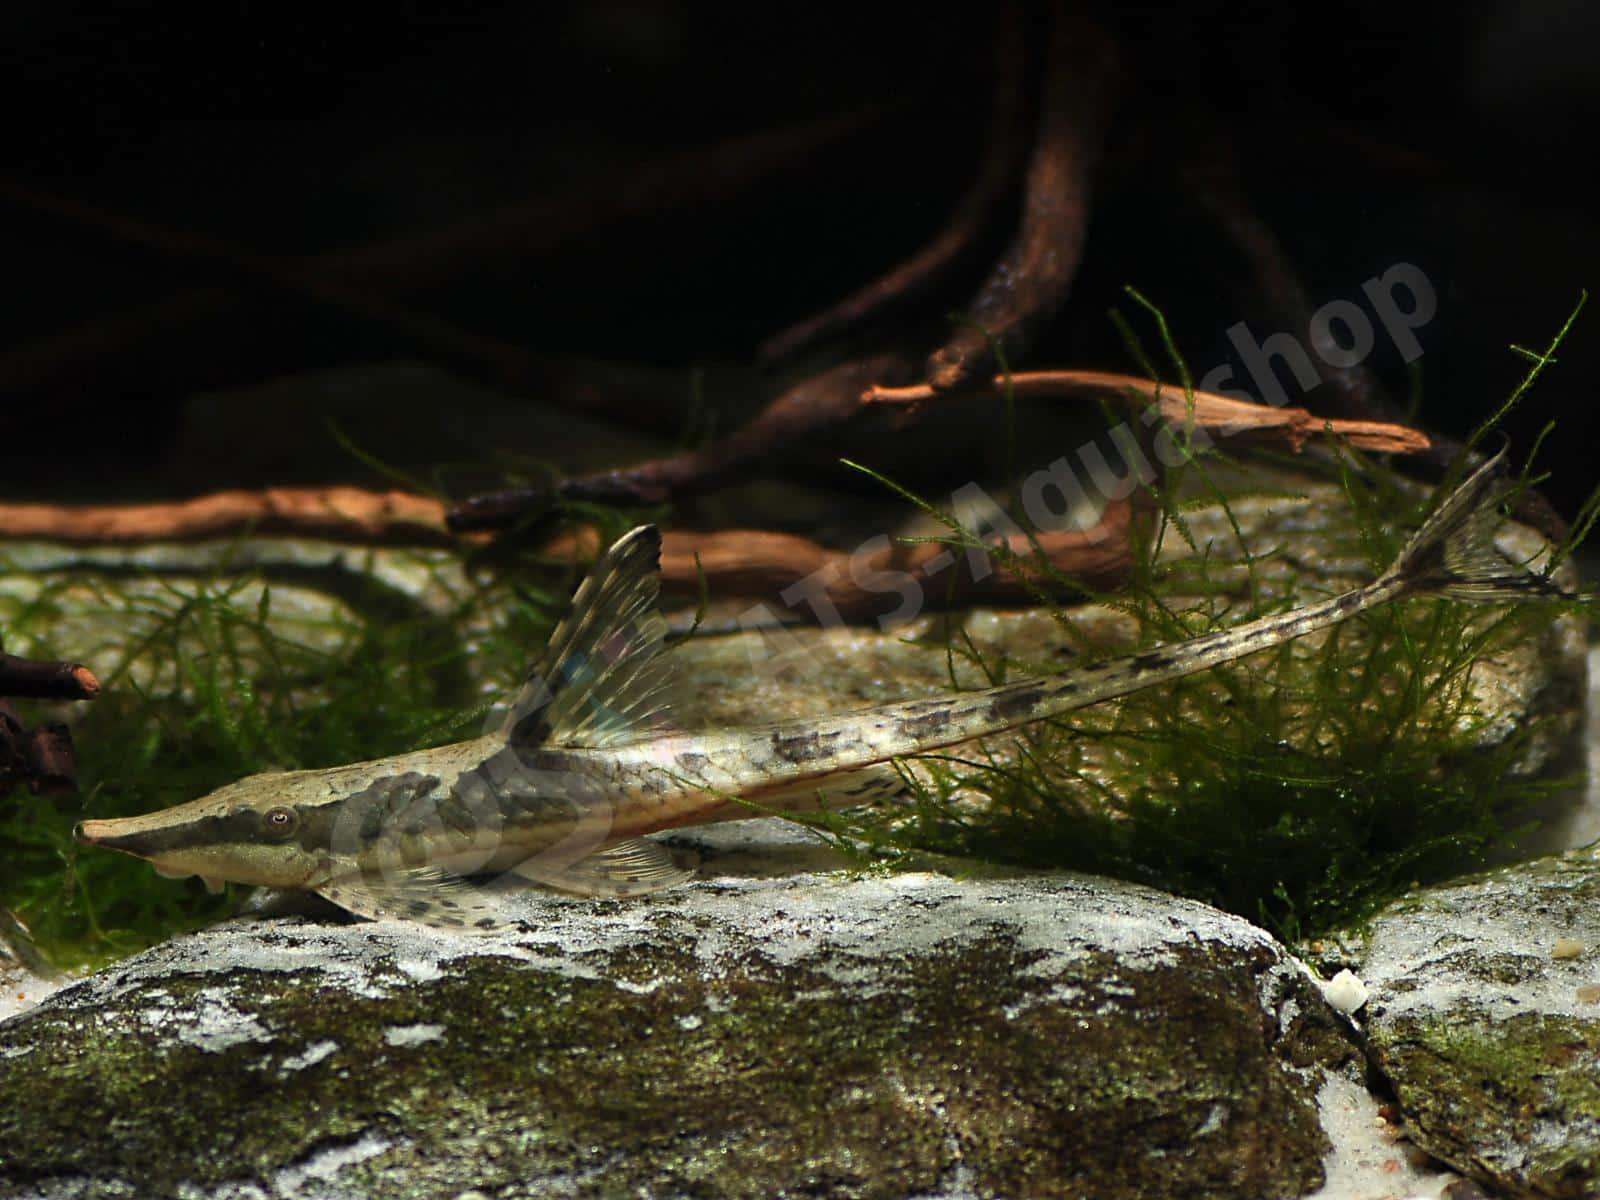 sturisomatichthys aureum enrico richter 0025 8